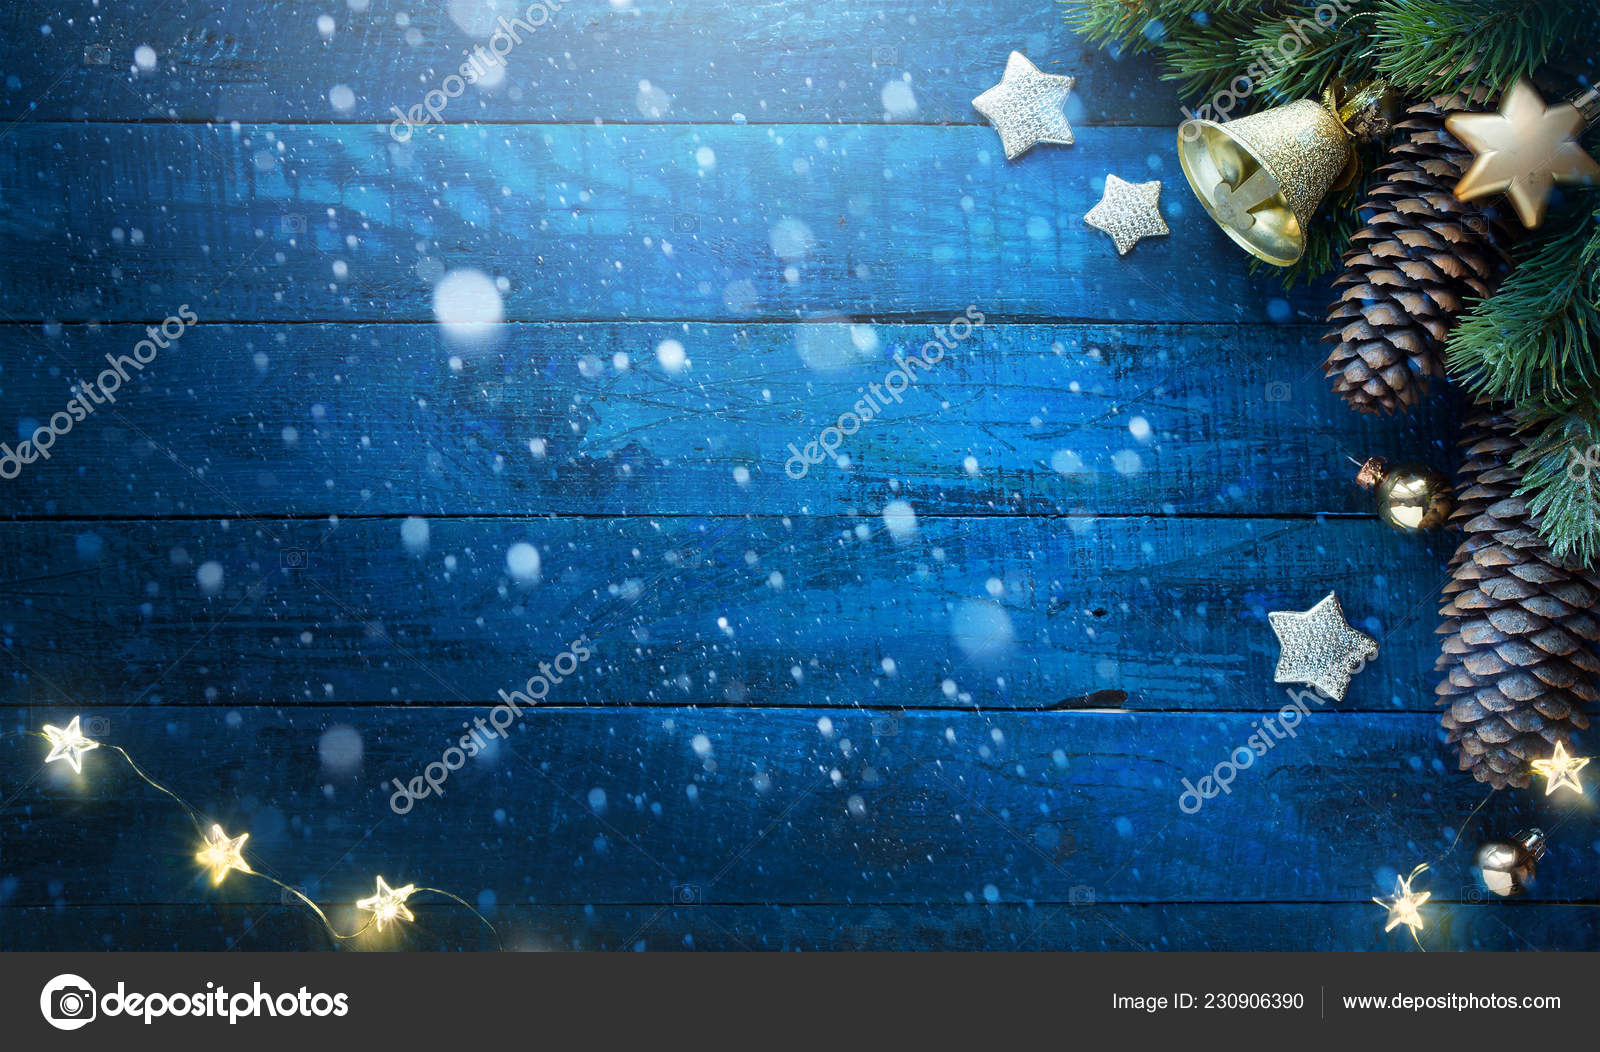 ᐈ blue christmas lights wallpaper stock backgrounds royalty free blue christmas backgrounds pictures download on depositphotos https depositphotos com 230906390 stock photo christmas tree blue wooden backgroun html